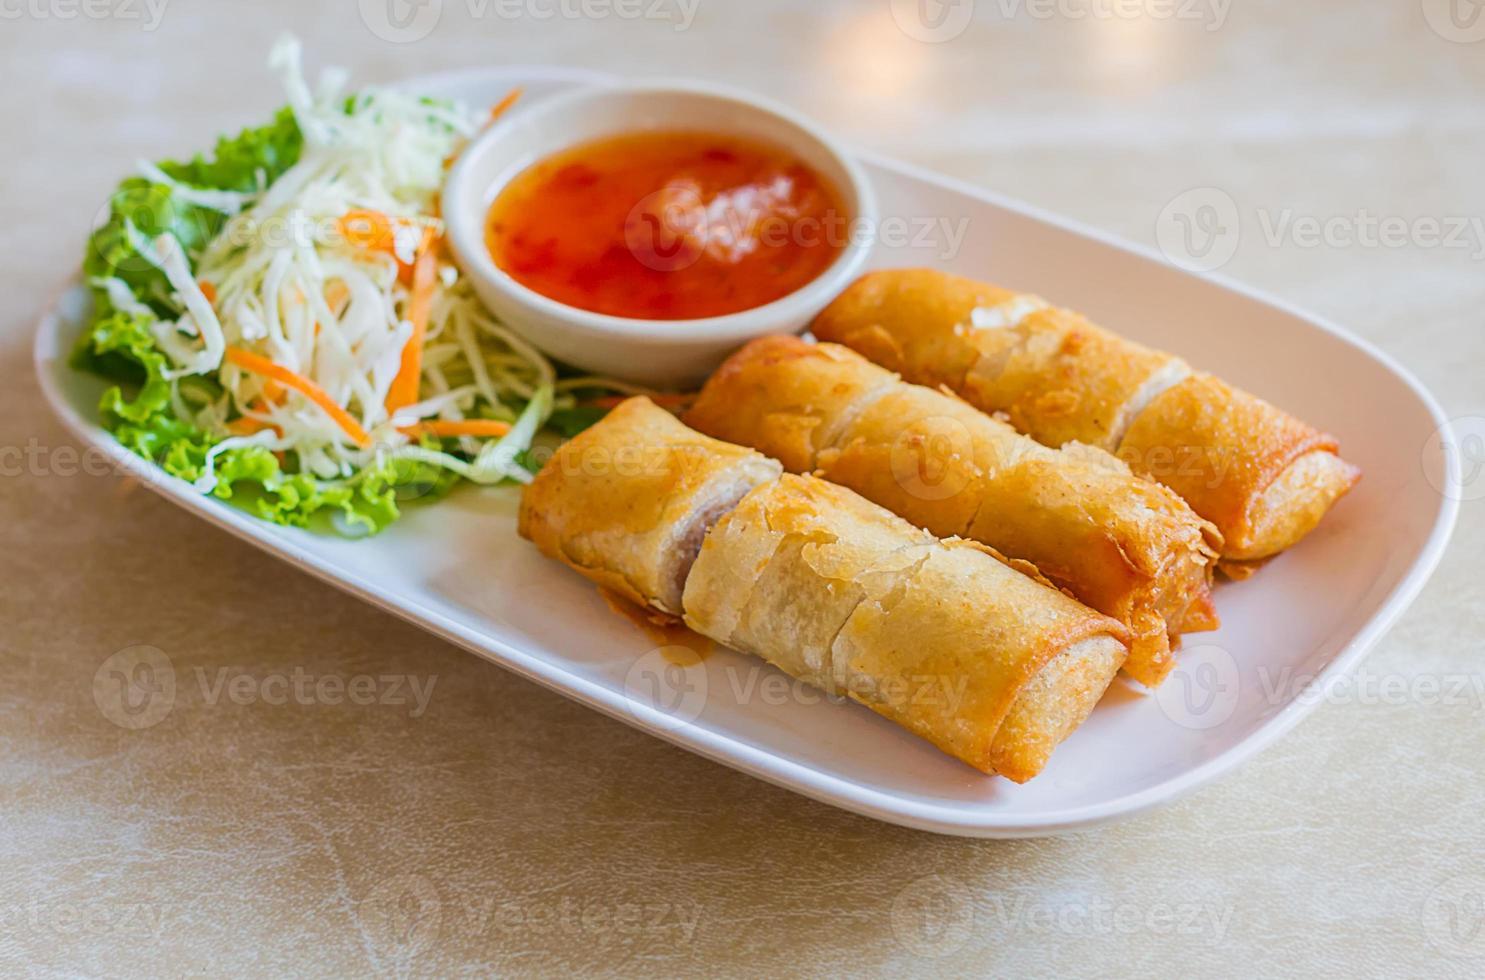 de gebraden Chinese traditionele lente rolt voedsel - Thailand foto